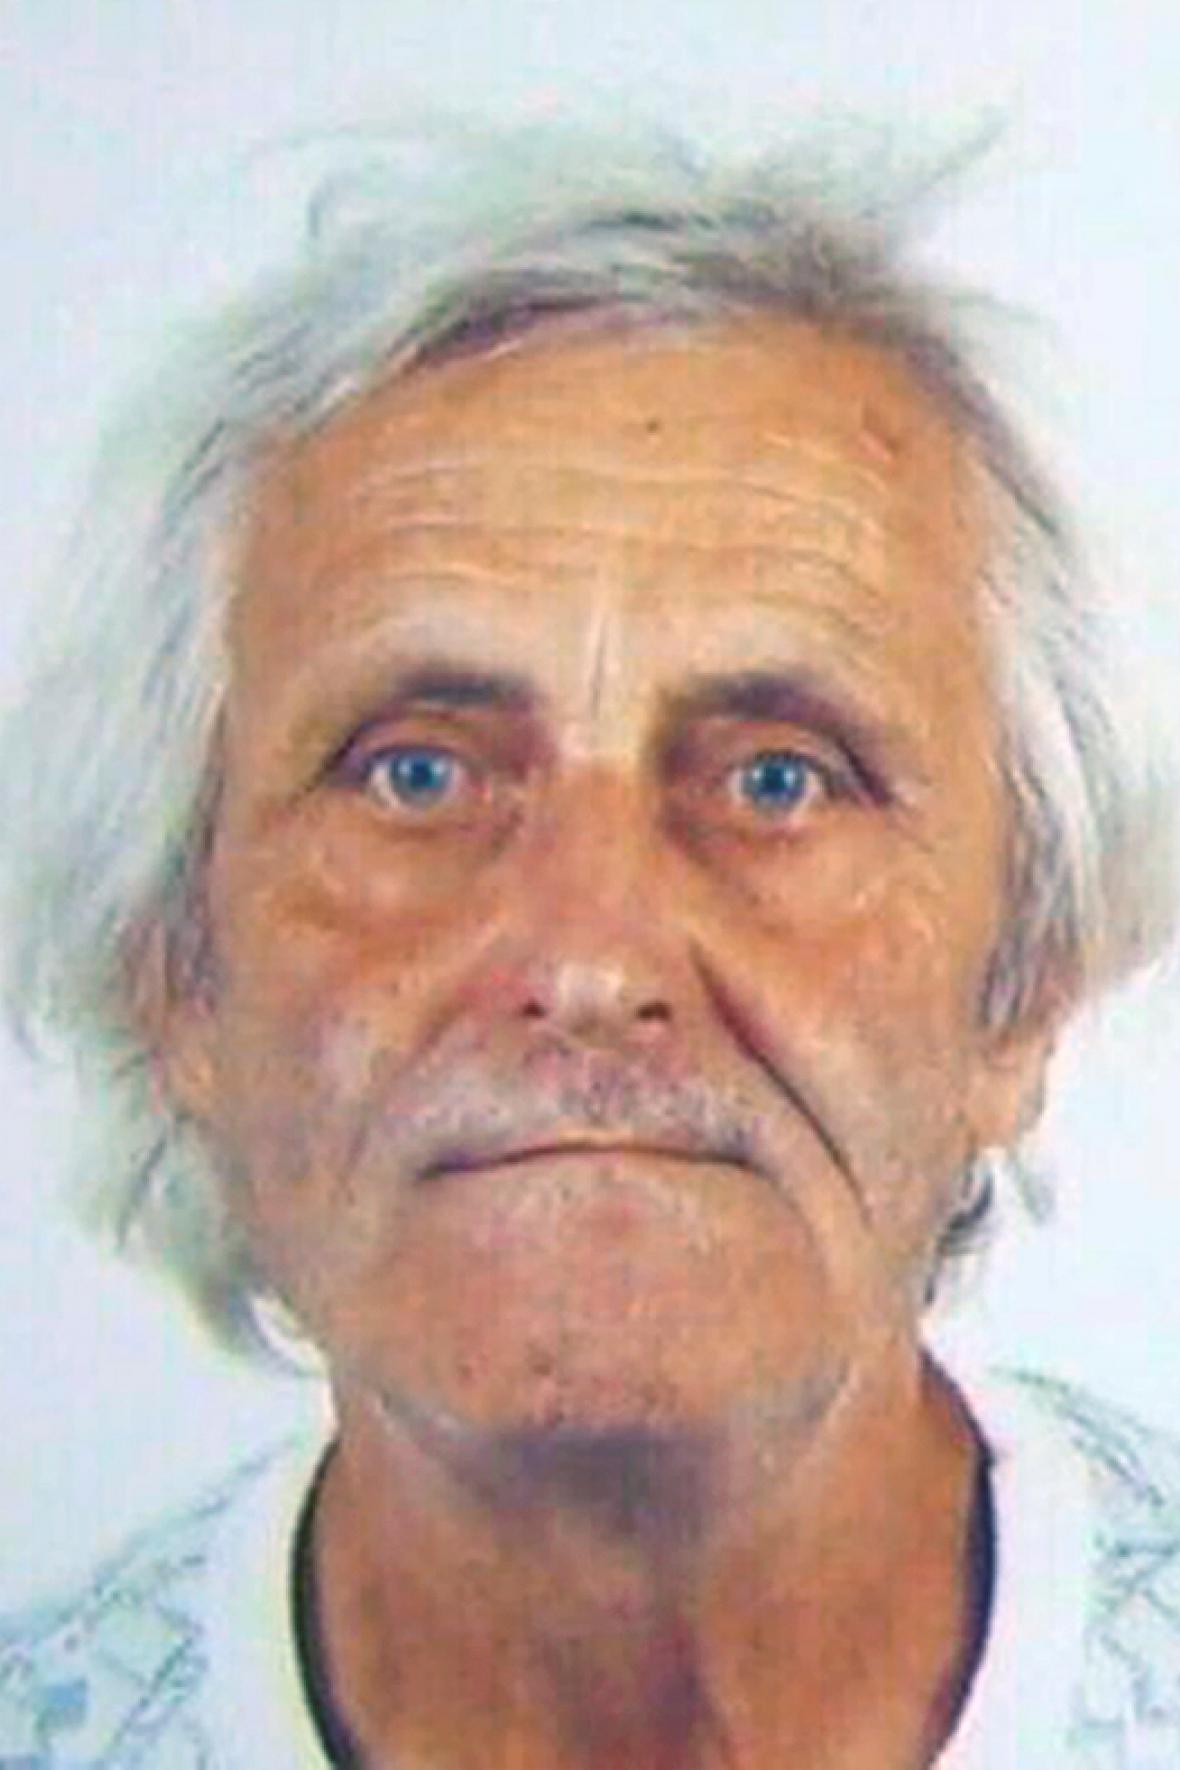 Pohřešovaný Karel Burda